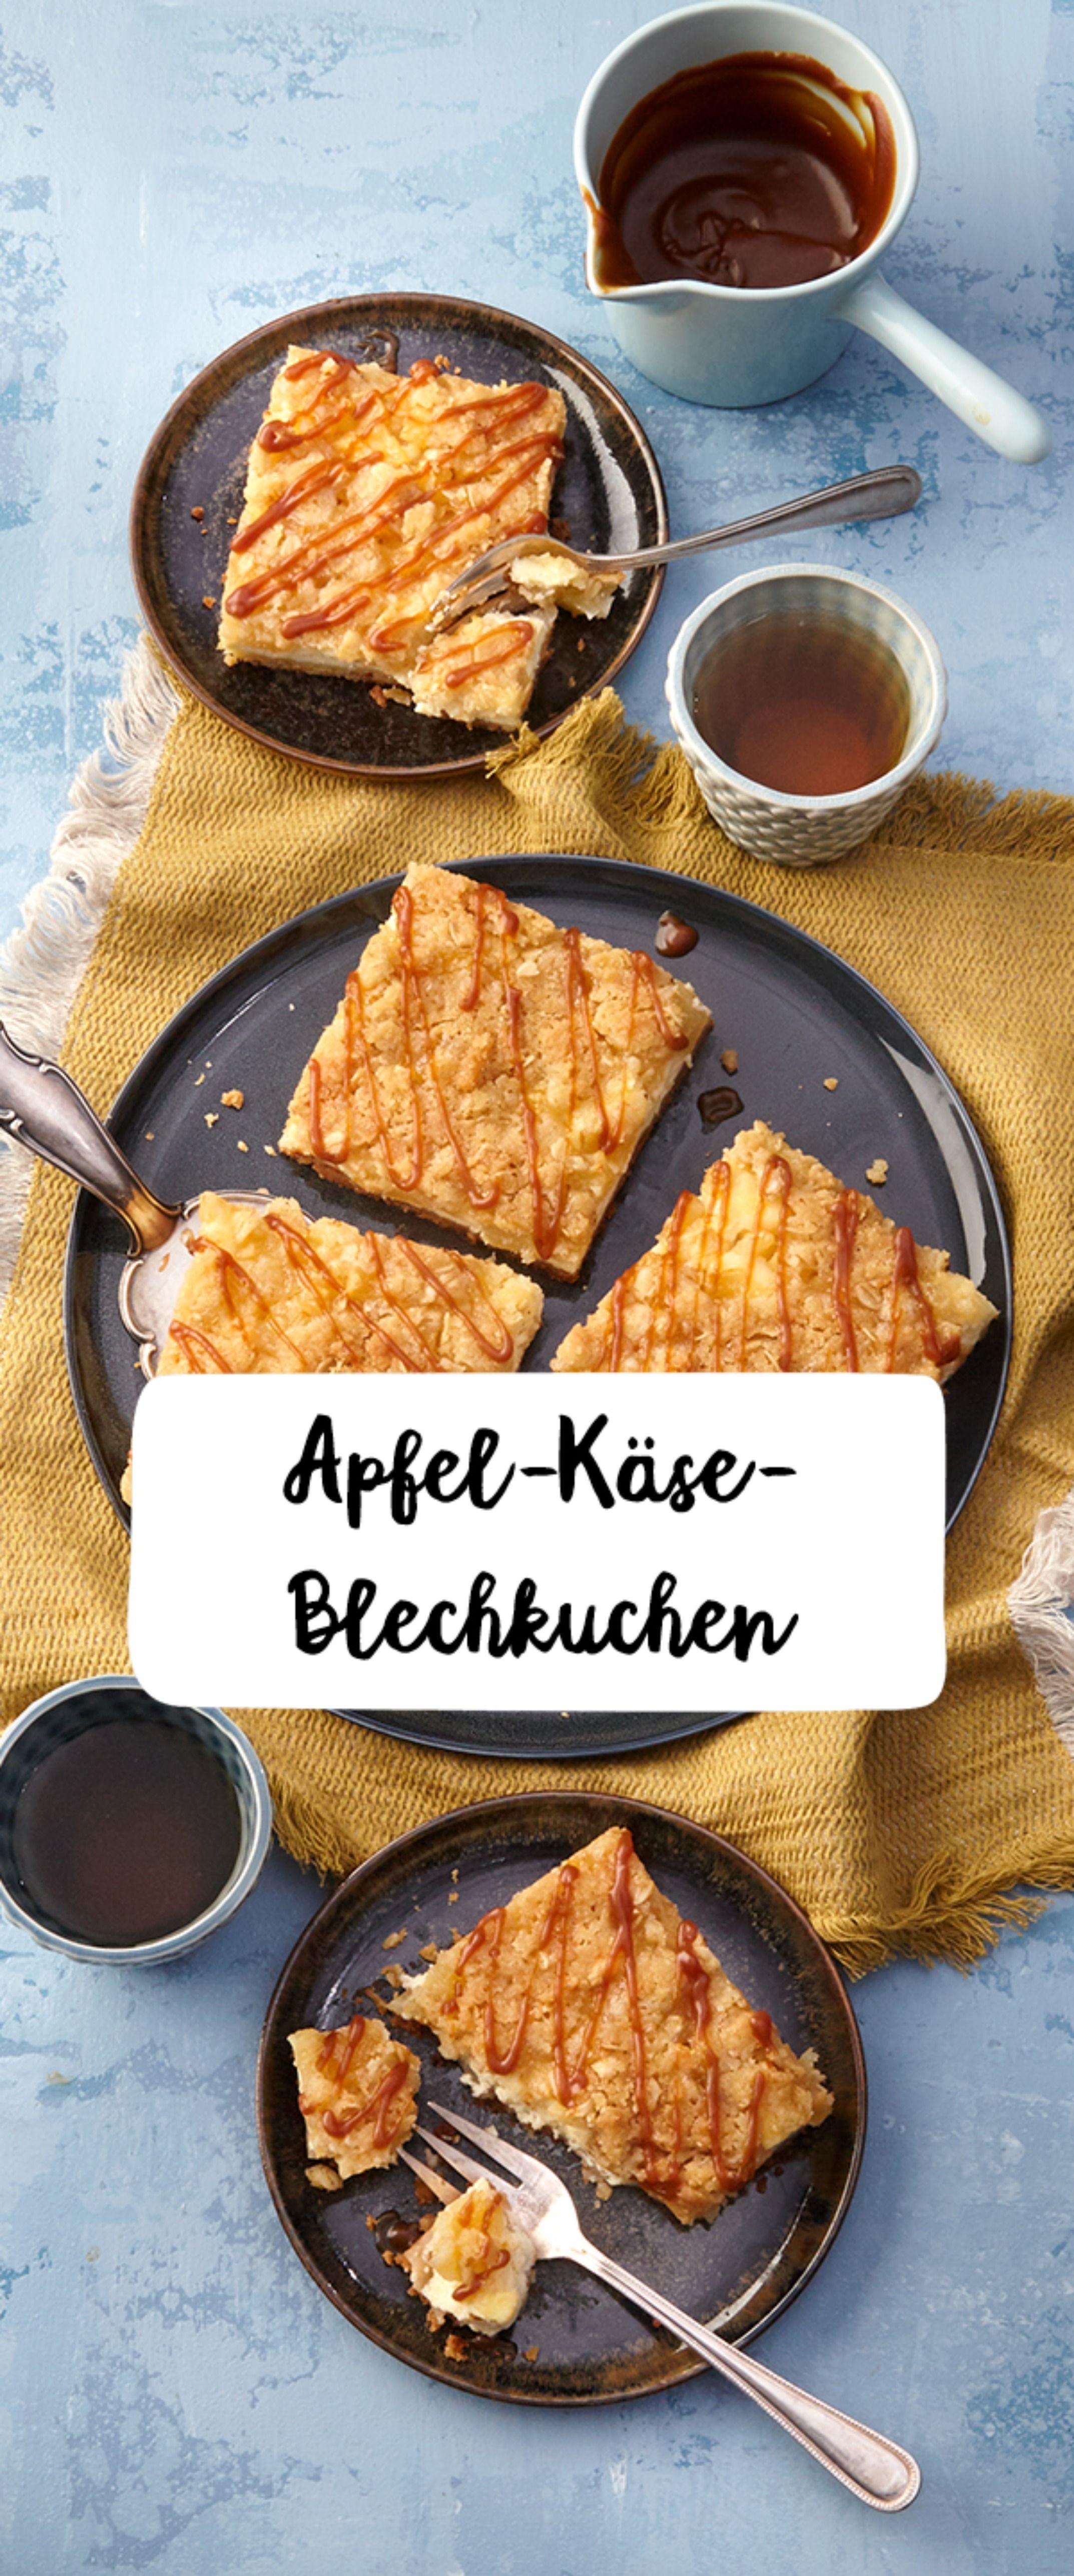 Apfel-Käse-Blechkuchen #kuchentisch